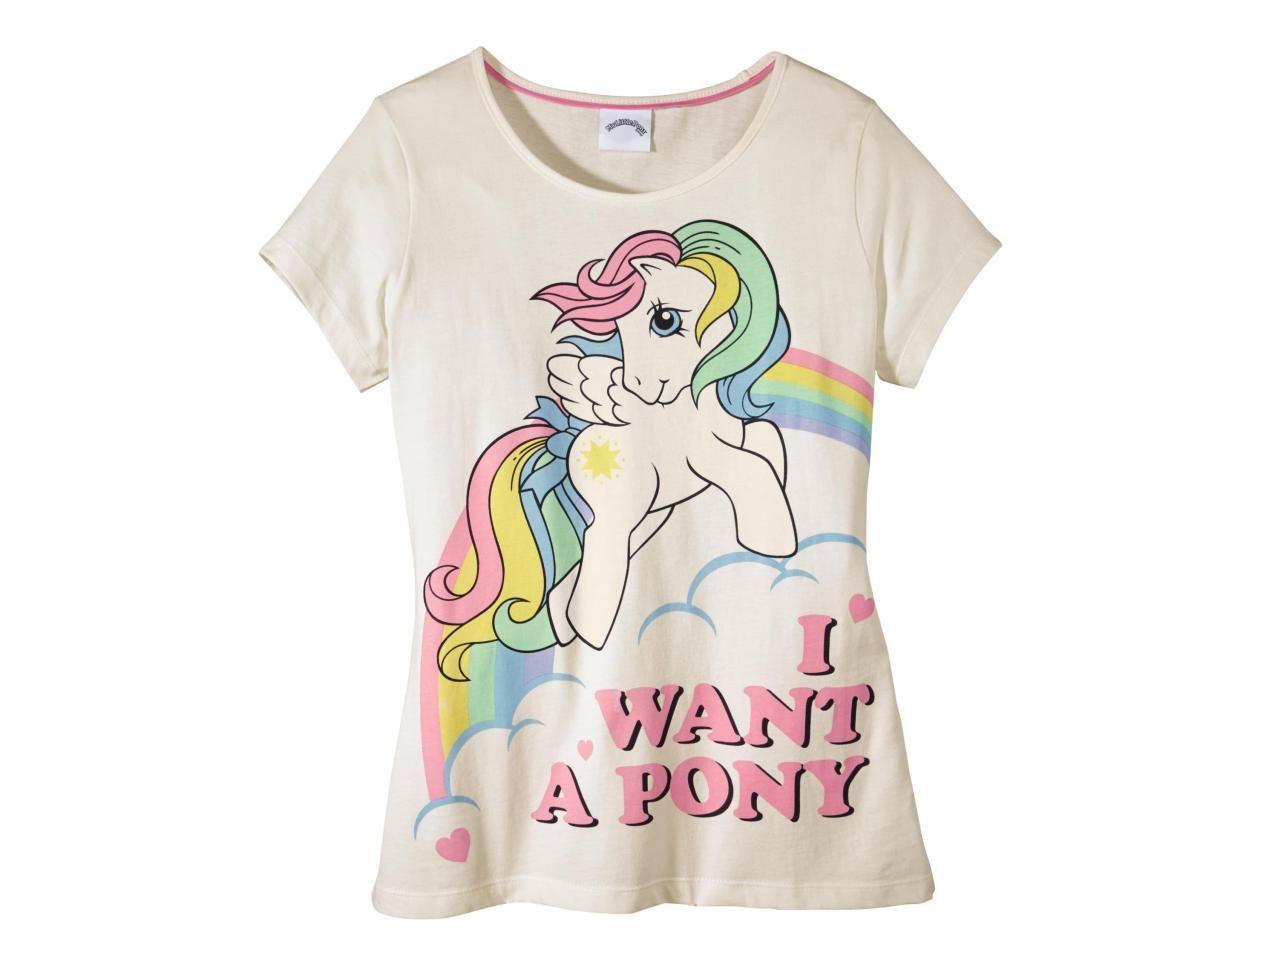 a basso prezzo 71ec0 48053 Pin su Kawaii, fairy kei & pastel cute life(style)